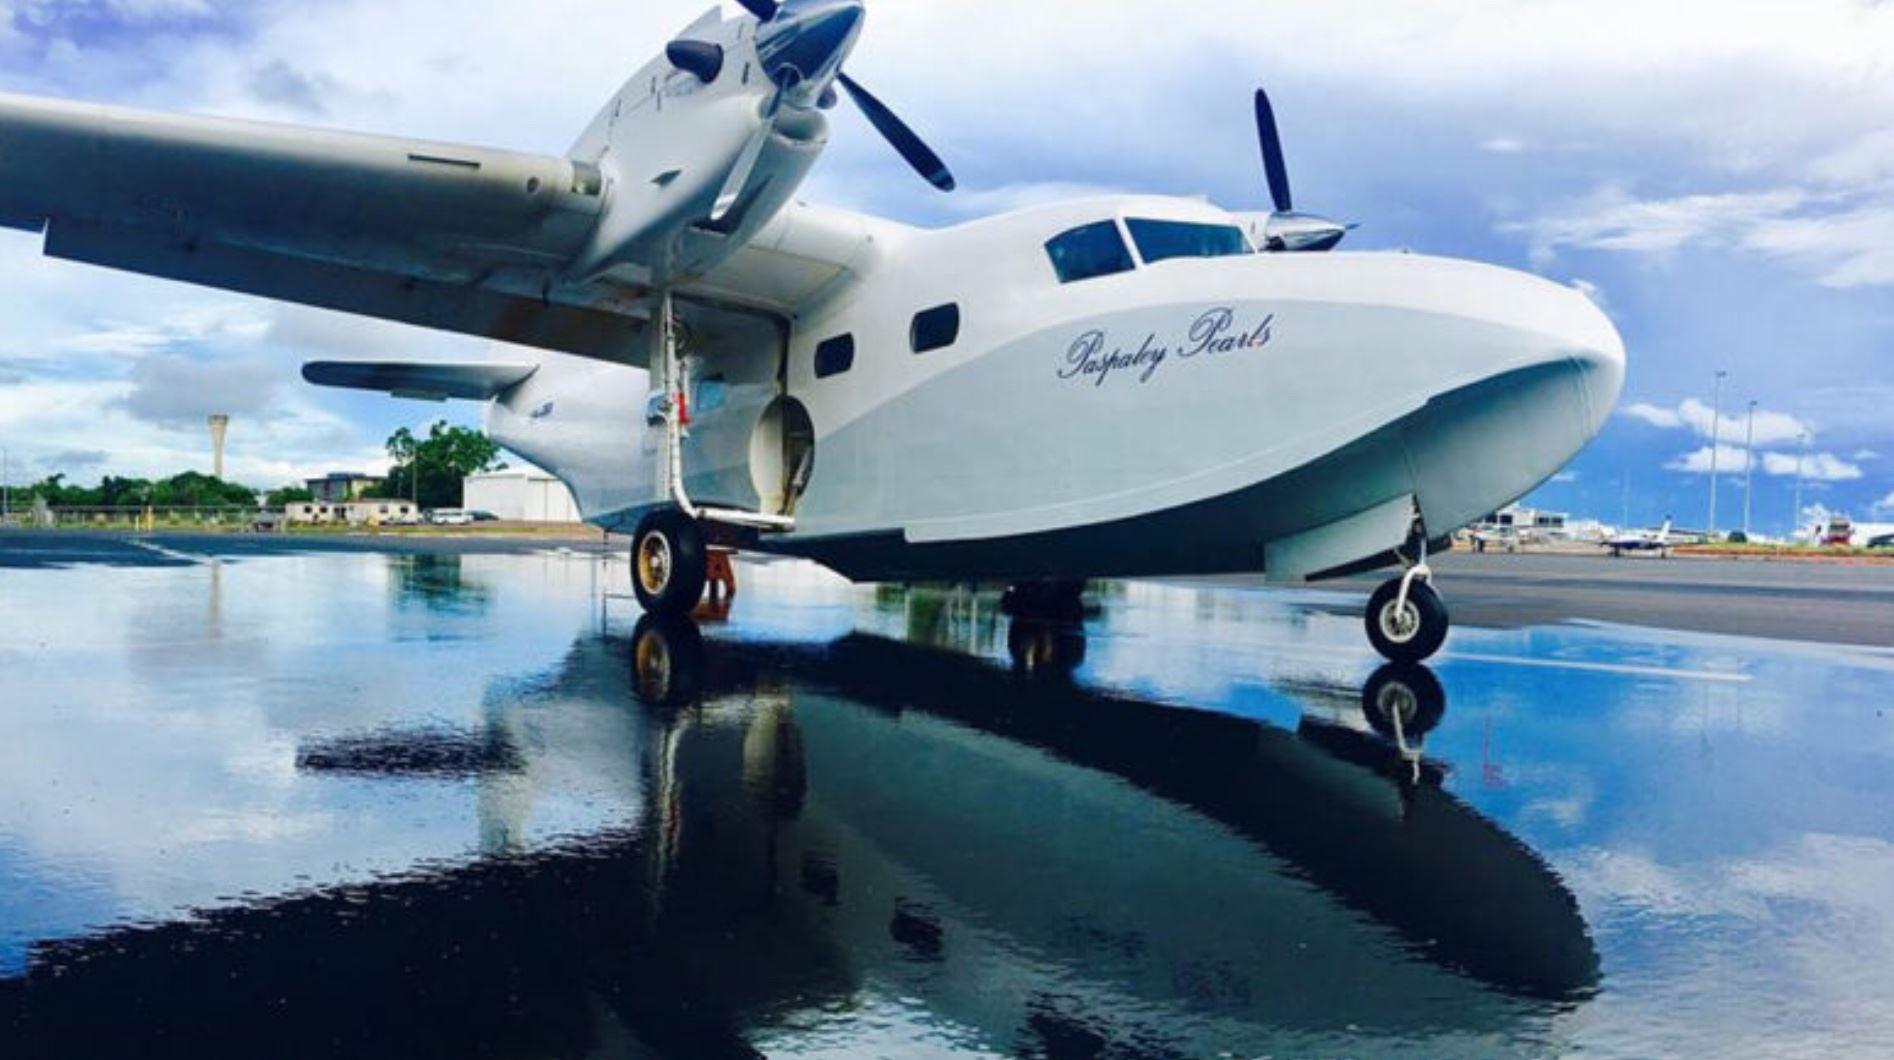 Seaplane Pilots Association Australia - Home